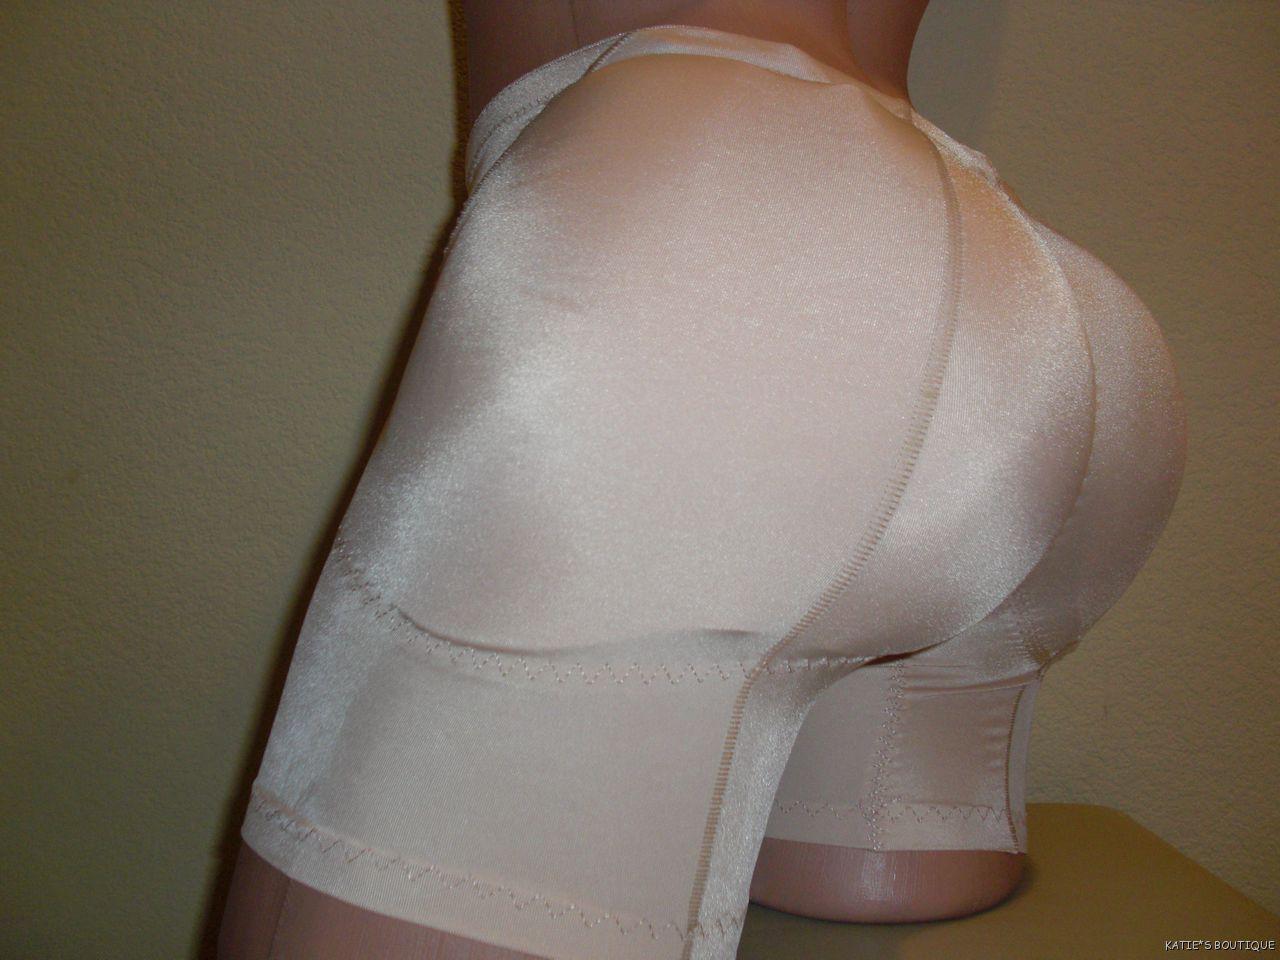 d3e51077b1 Butt and Hip Enhancer BOOTY PADDED Panty Underwear Boyshorts CROSSDRESSER  S2XL